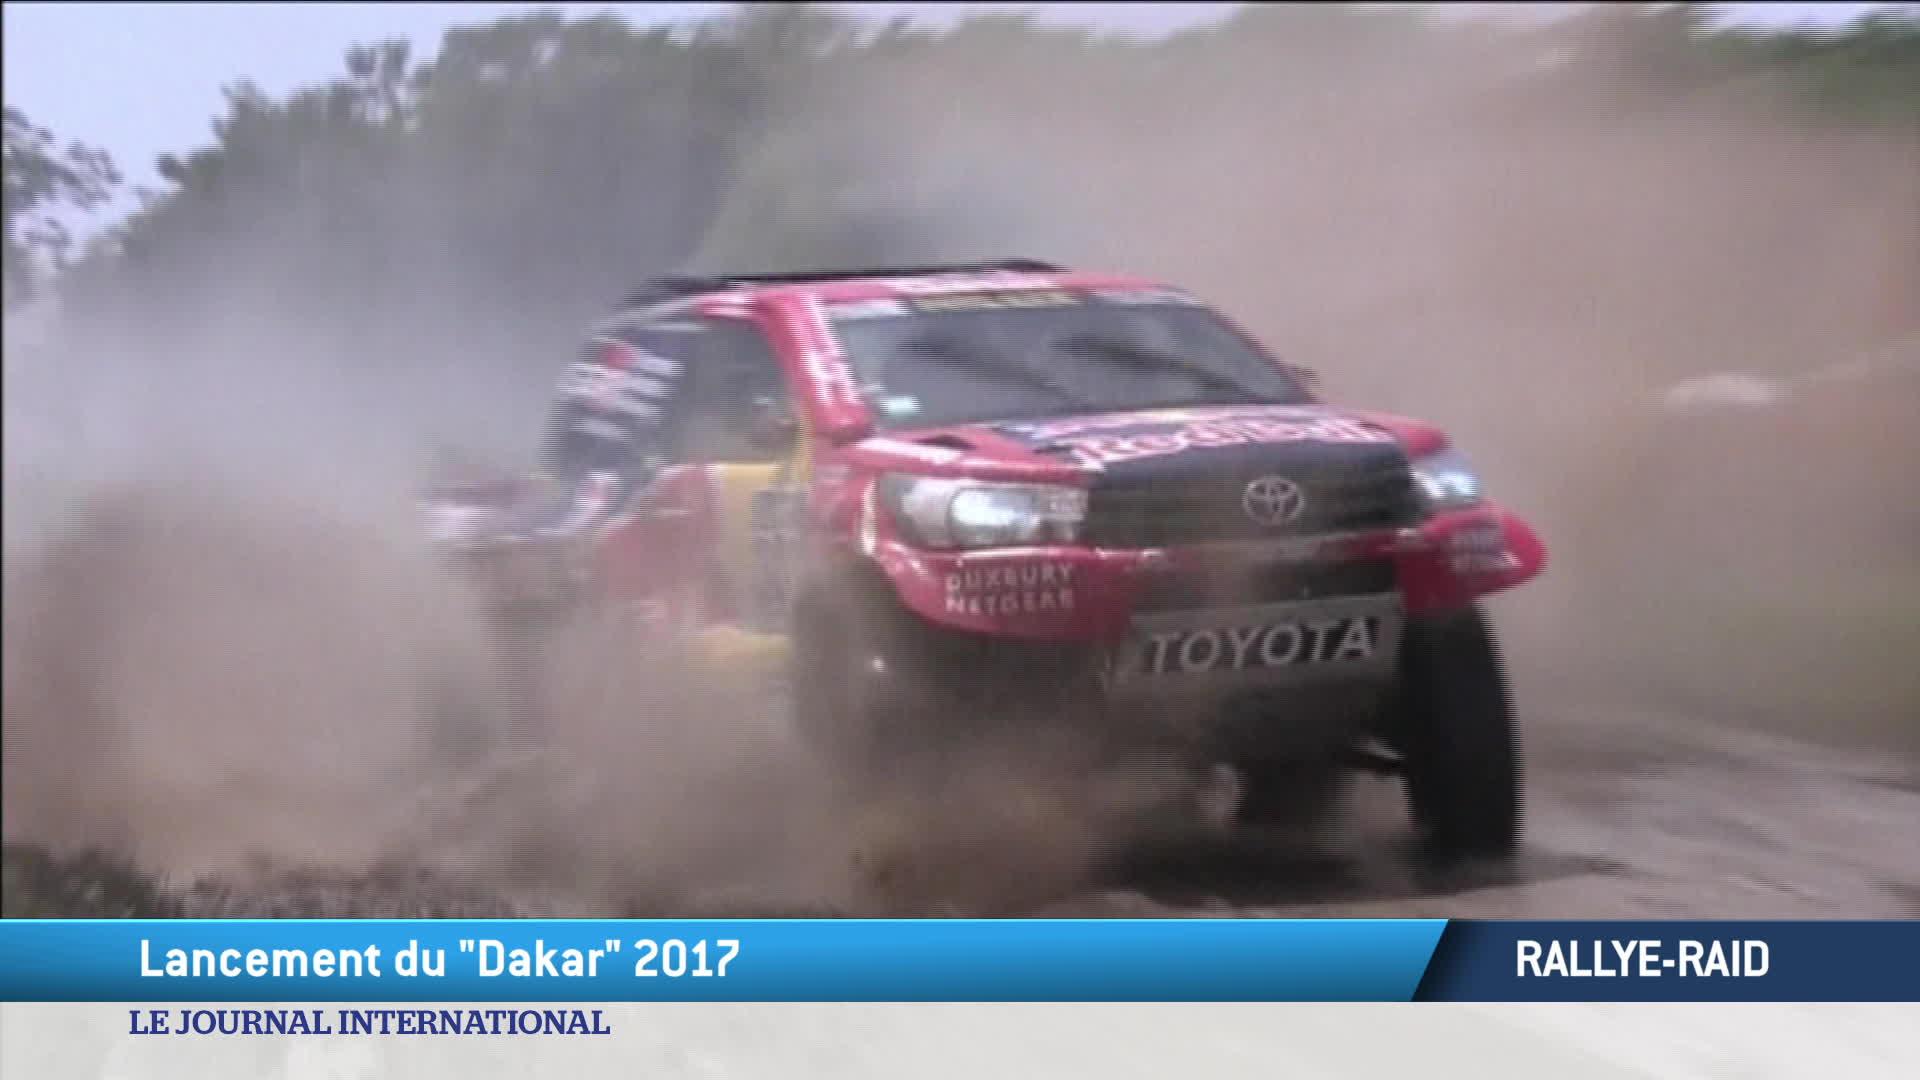 Rallye : lancement du Dakar 2017